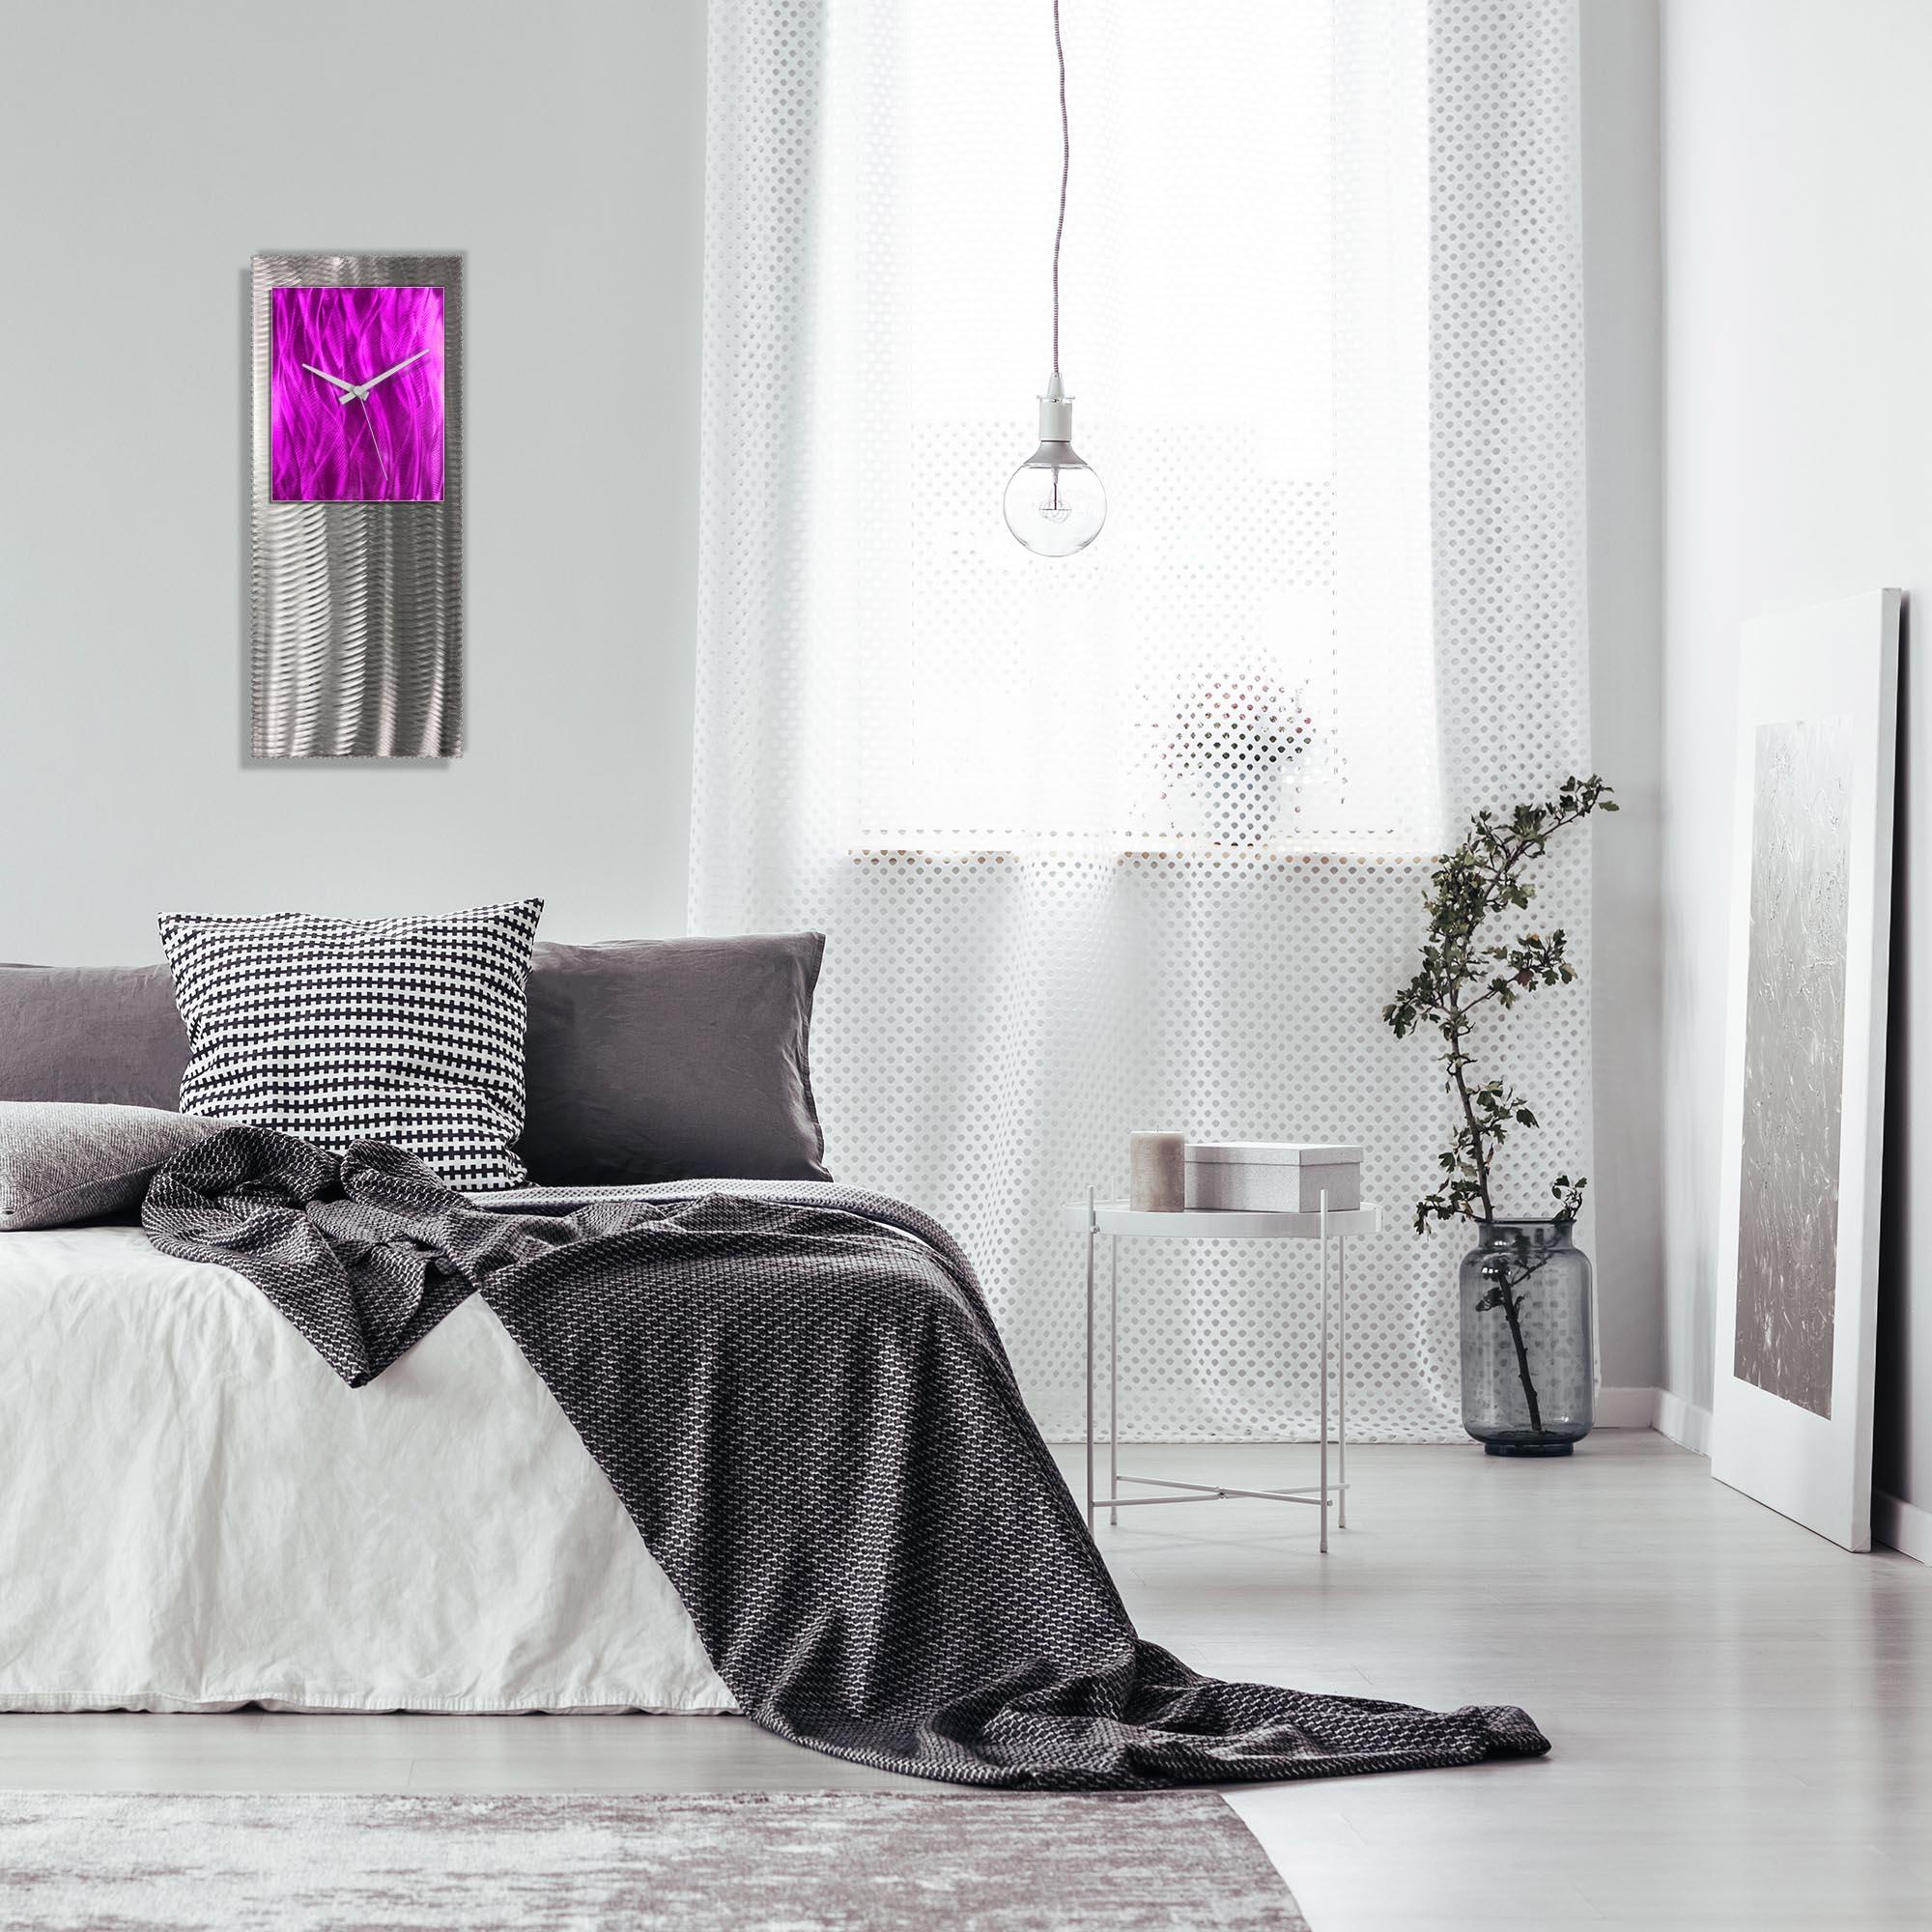 Metal Art Studio Abstract Decor Pink Studio Clock 10in x 24in - Lifestyle View